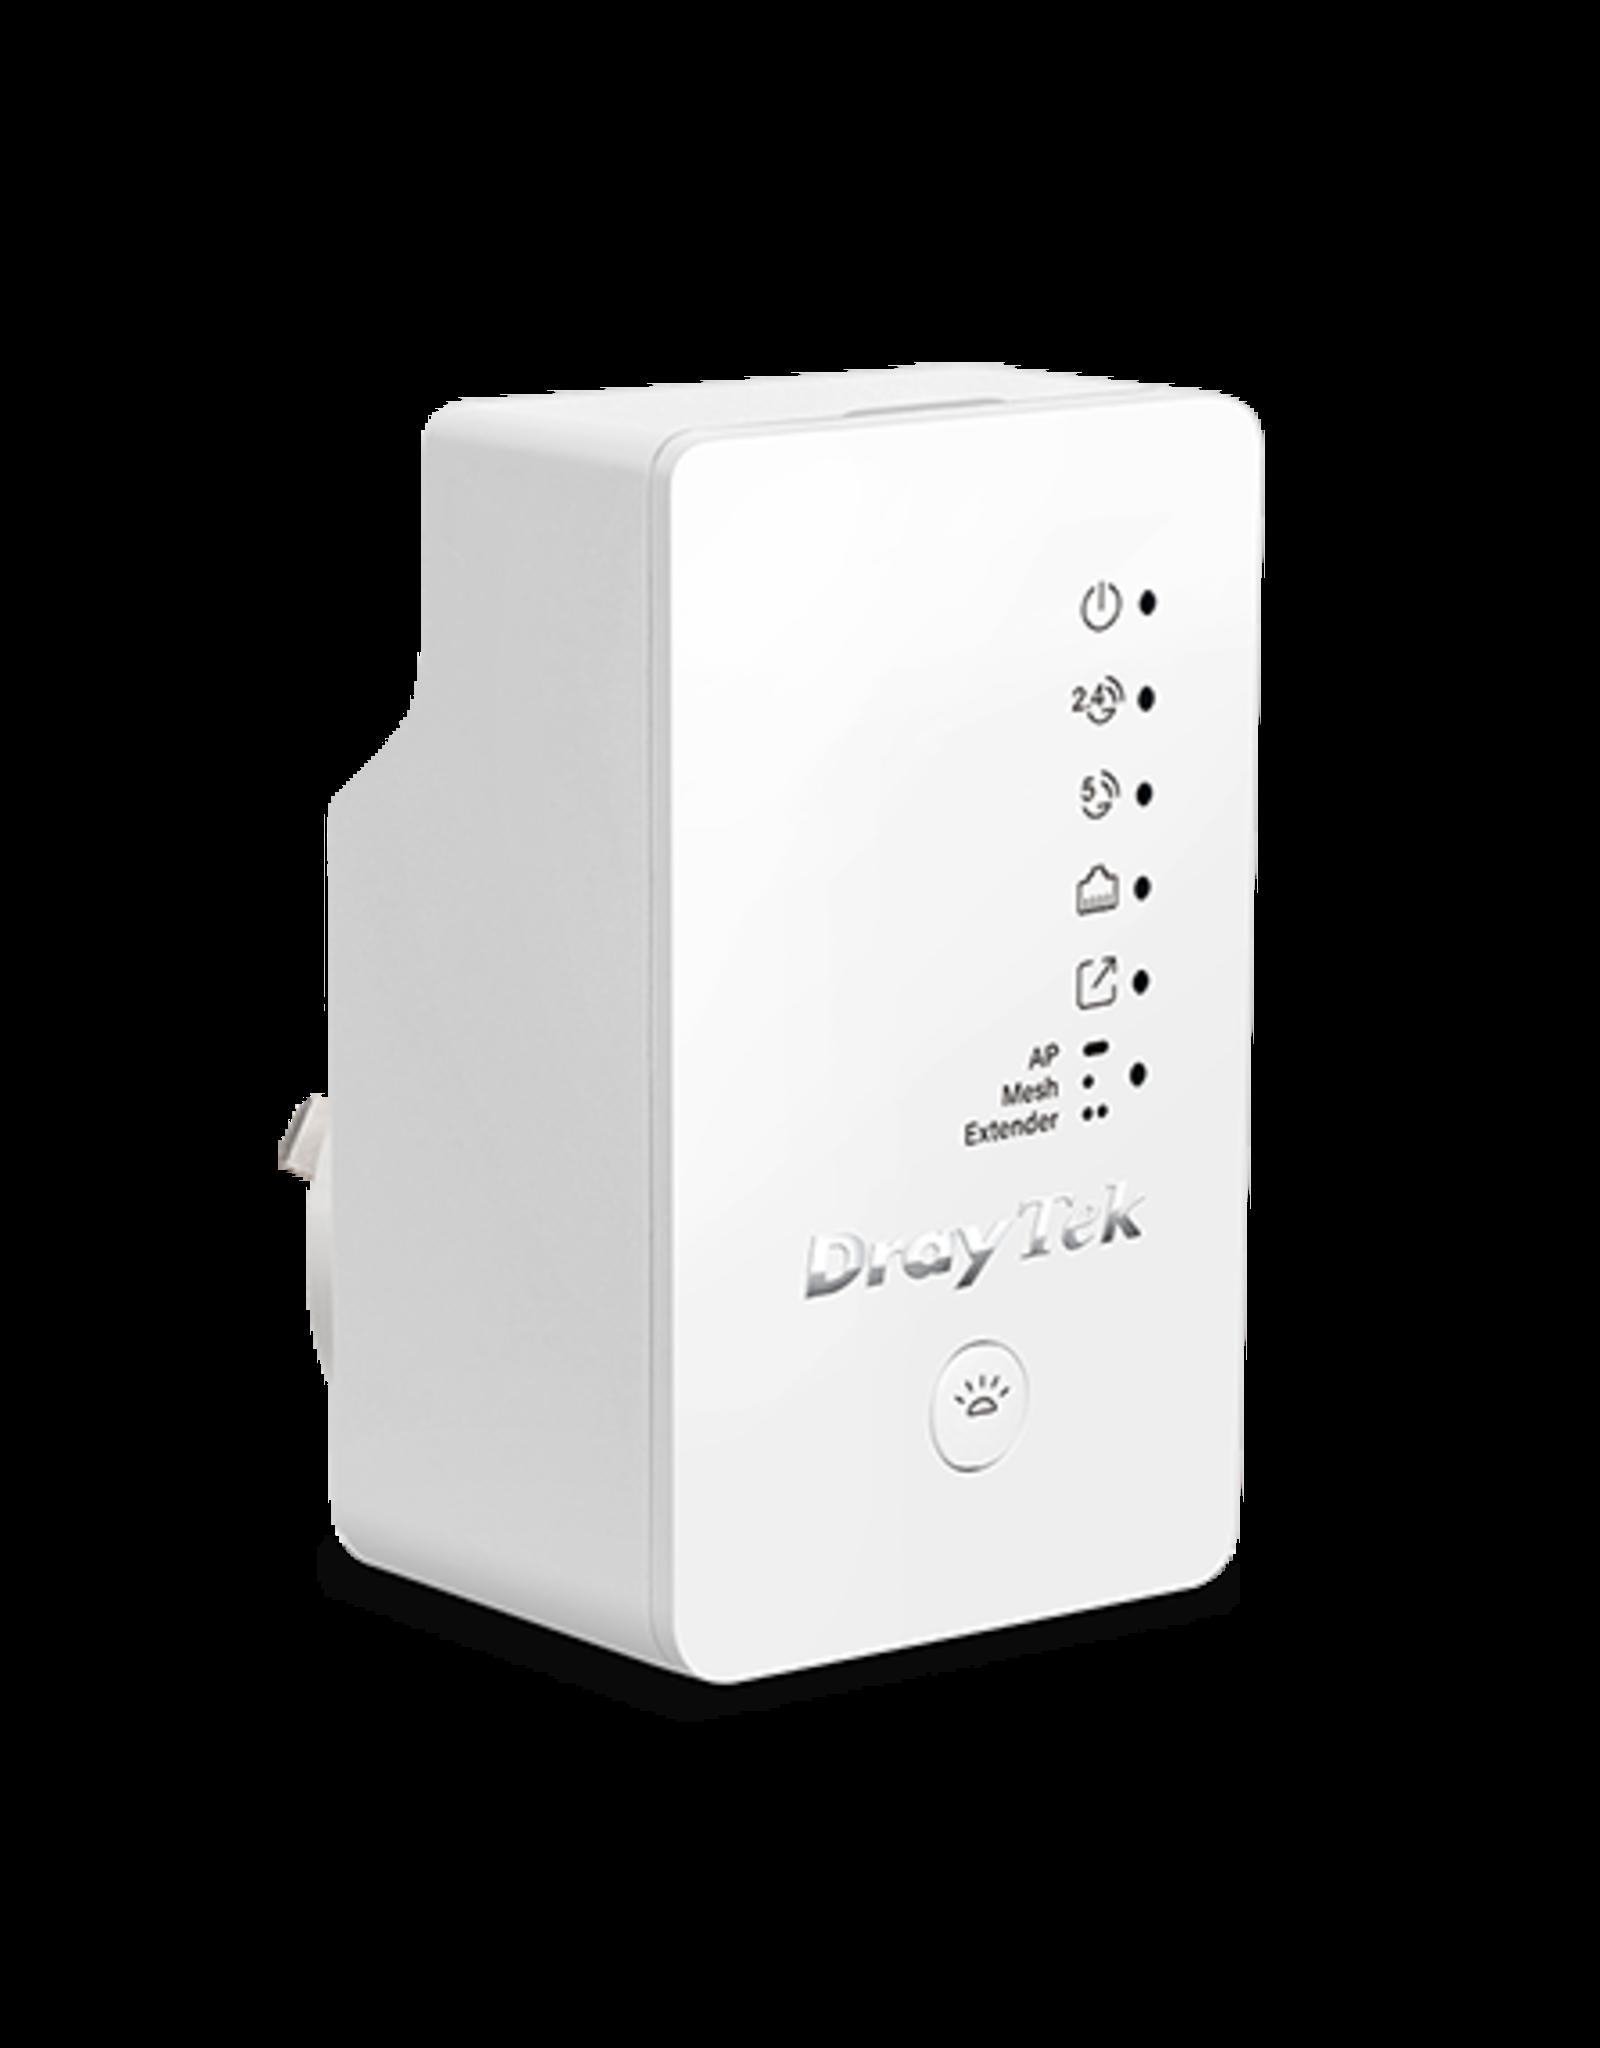 Draytek Draytek VigorAP 802 802.11ac Wave 2 Range Extender/Access Point with Mesh Wi-Fi and wall plug housing